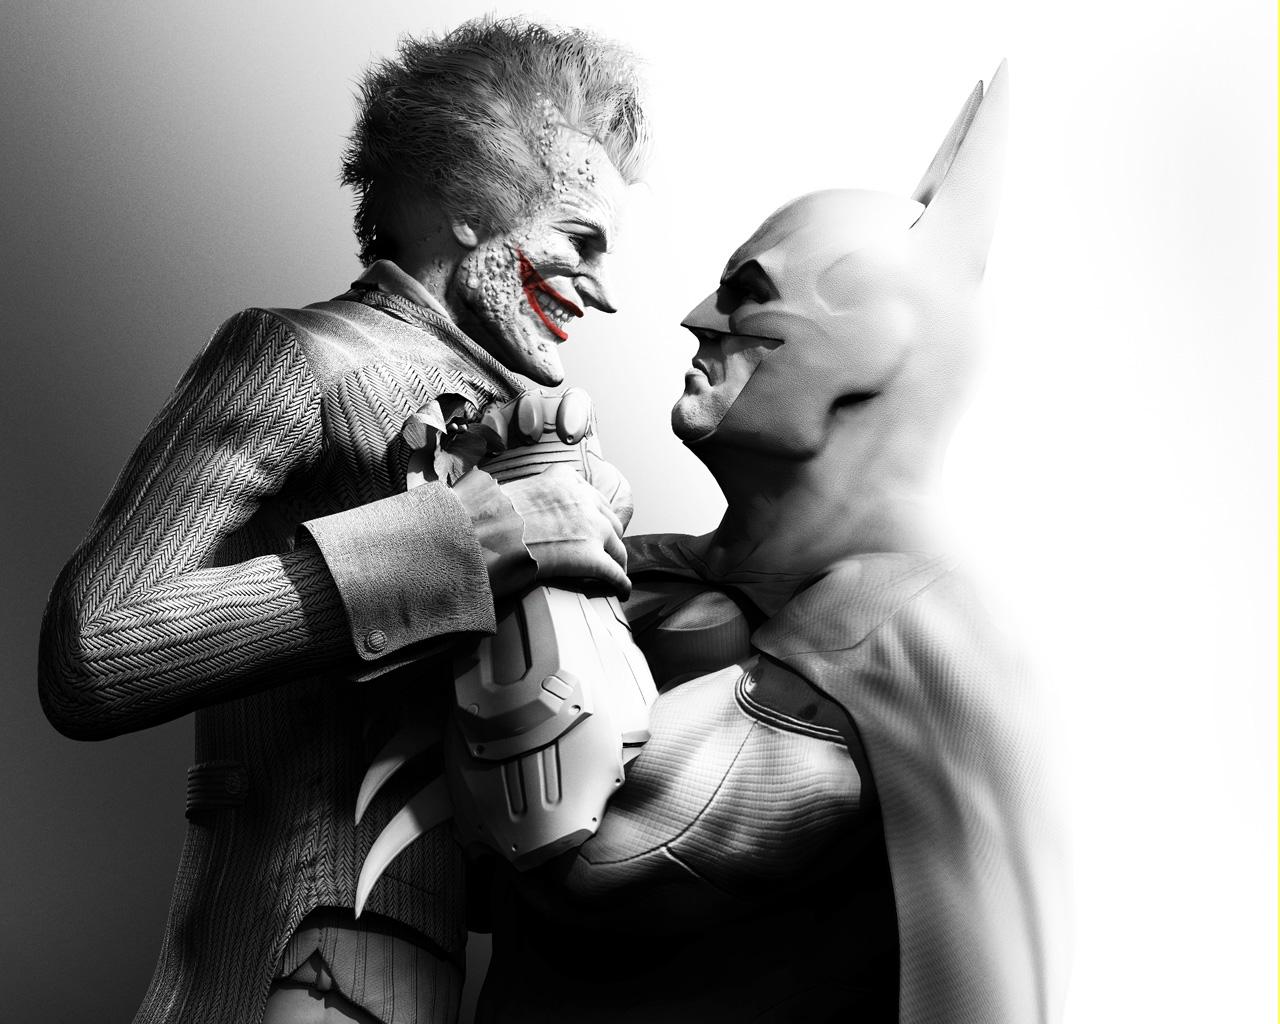 Home Wallpaper Batman Arkham City Batman Arkham City   Joker Wallpaper 1280x1024